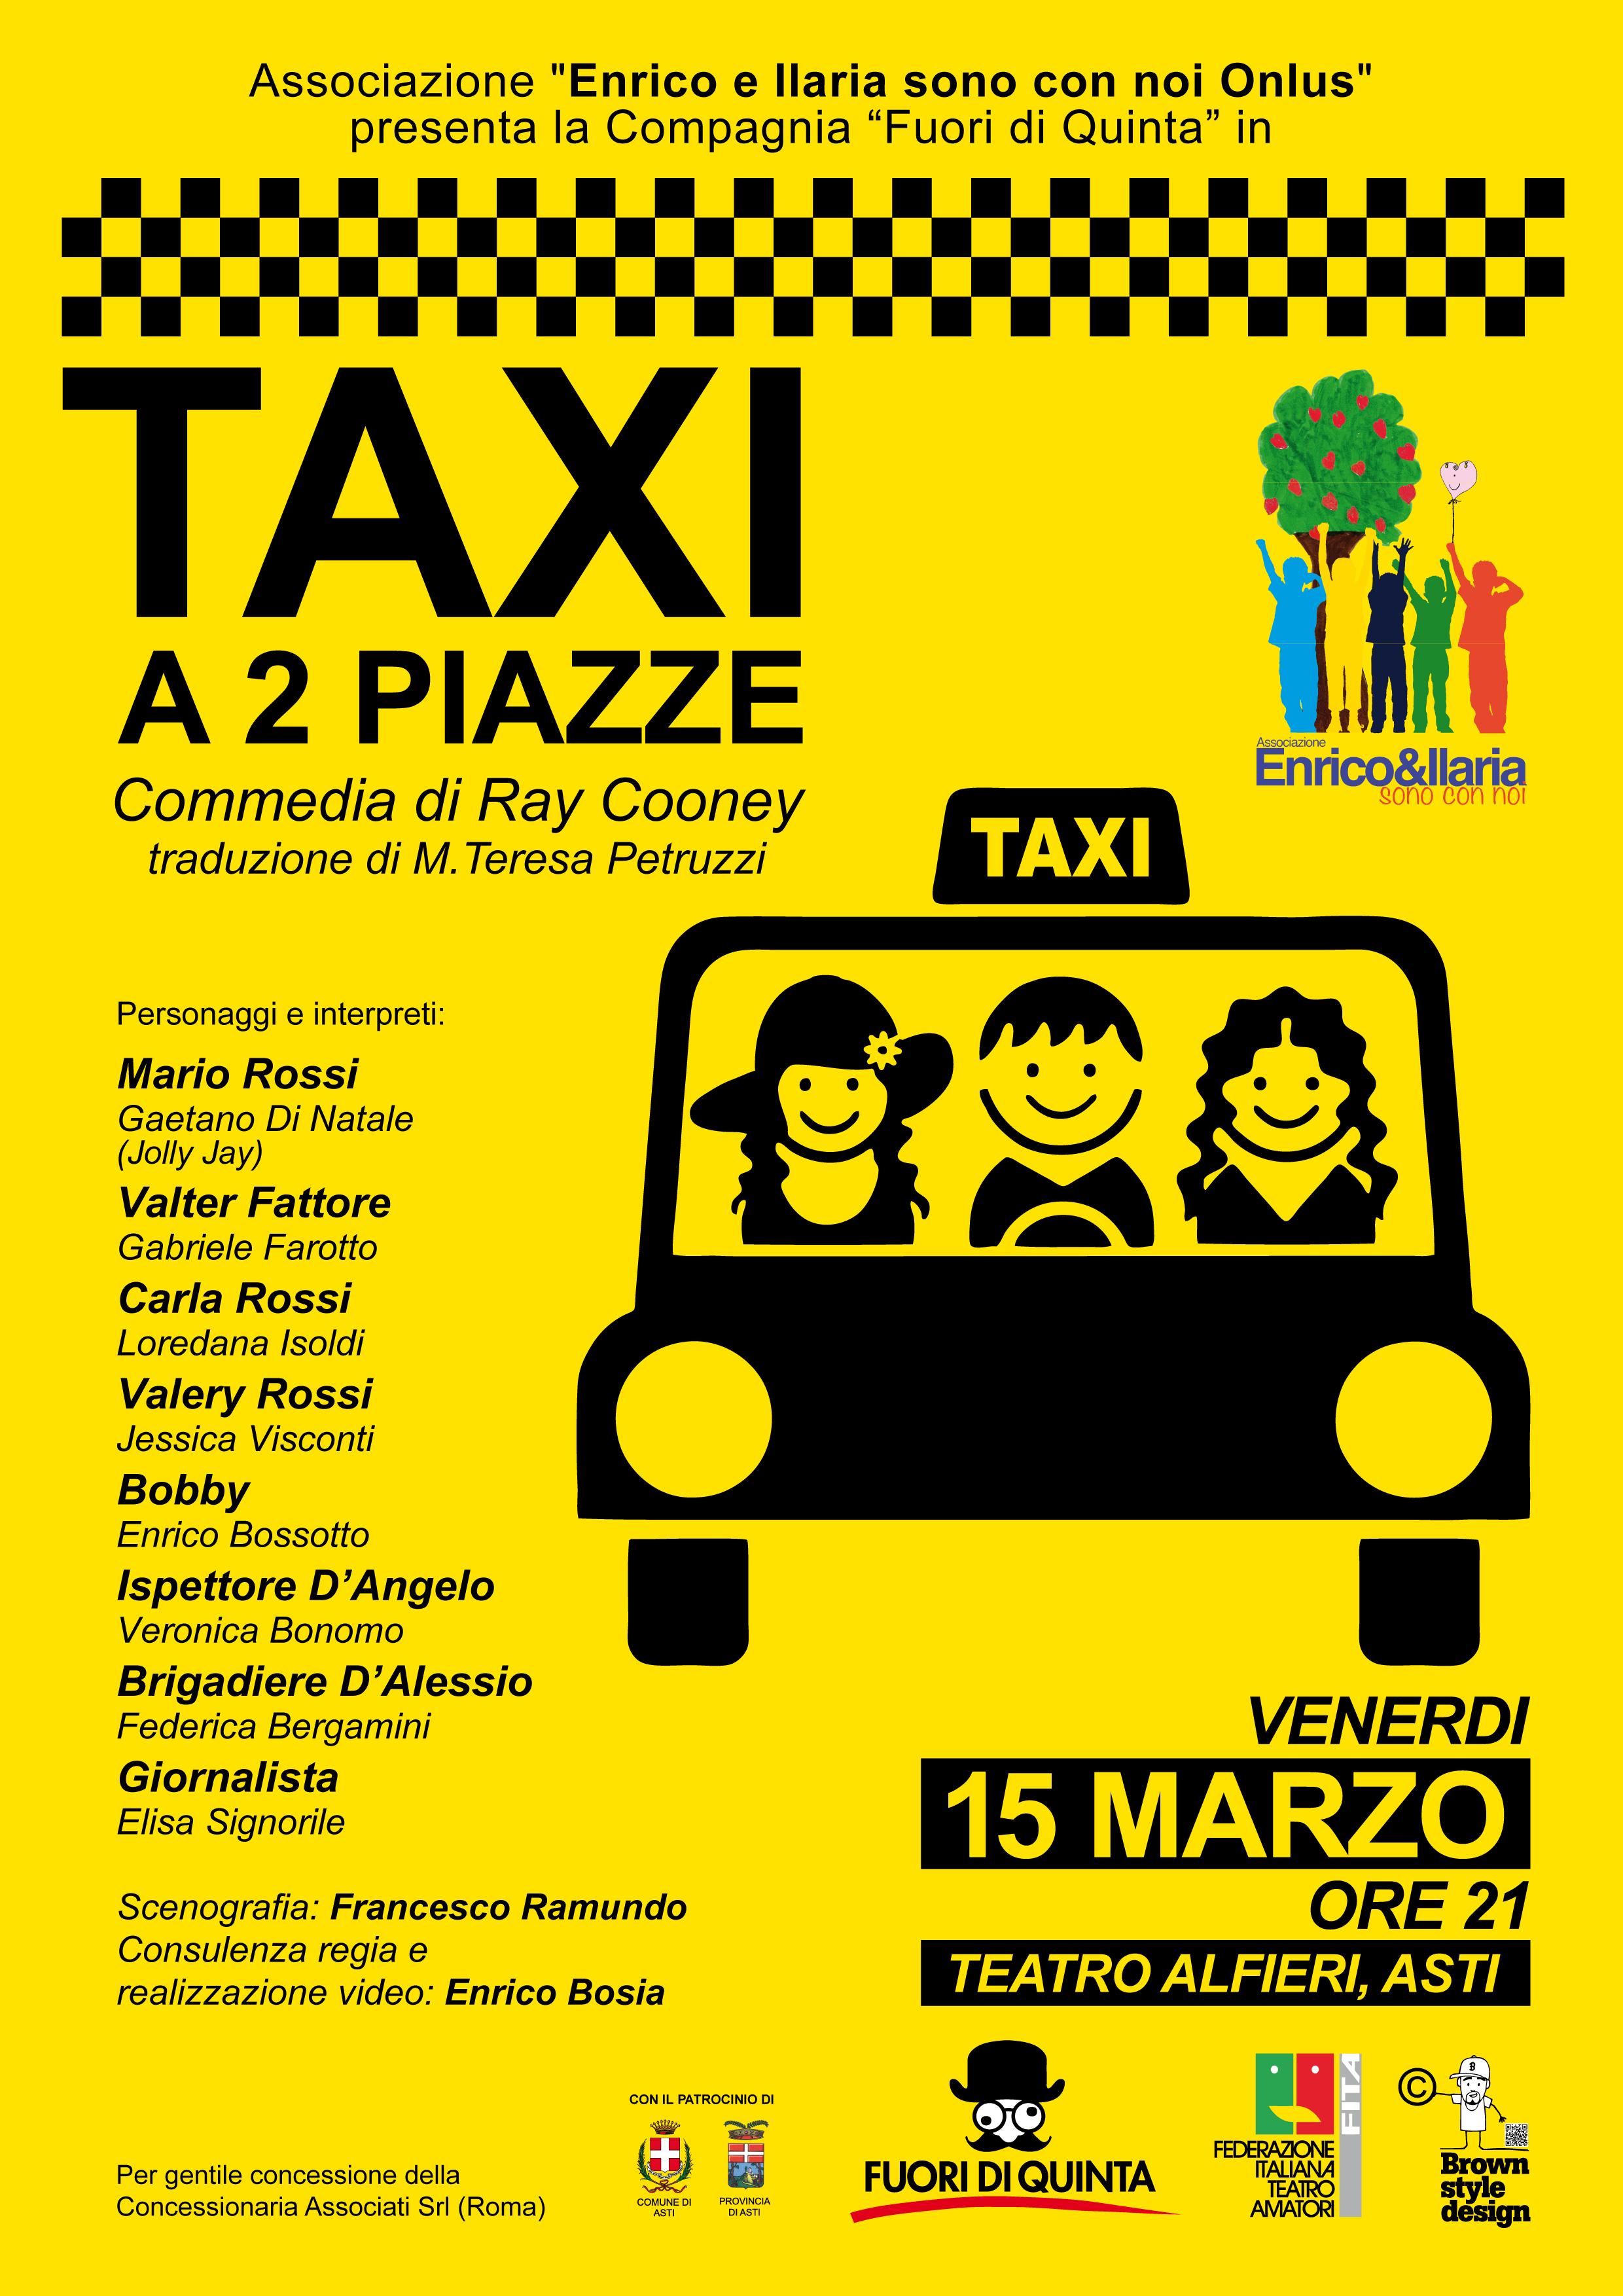 Fuori di Quinta-Taxi a 2 piazze